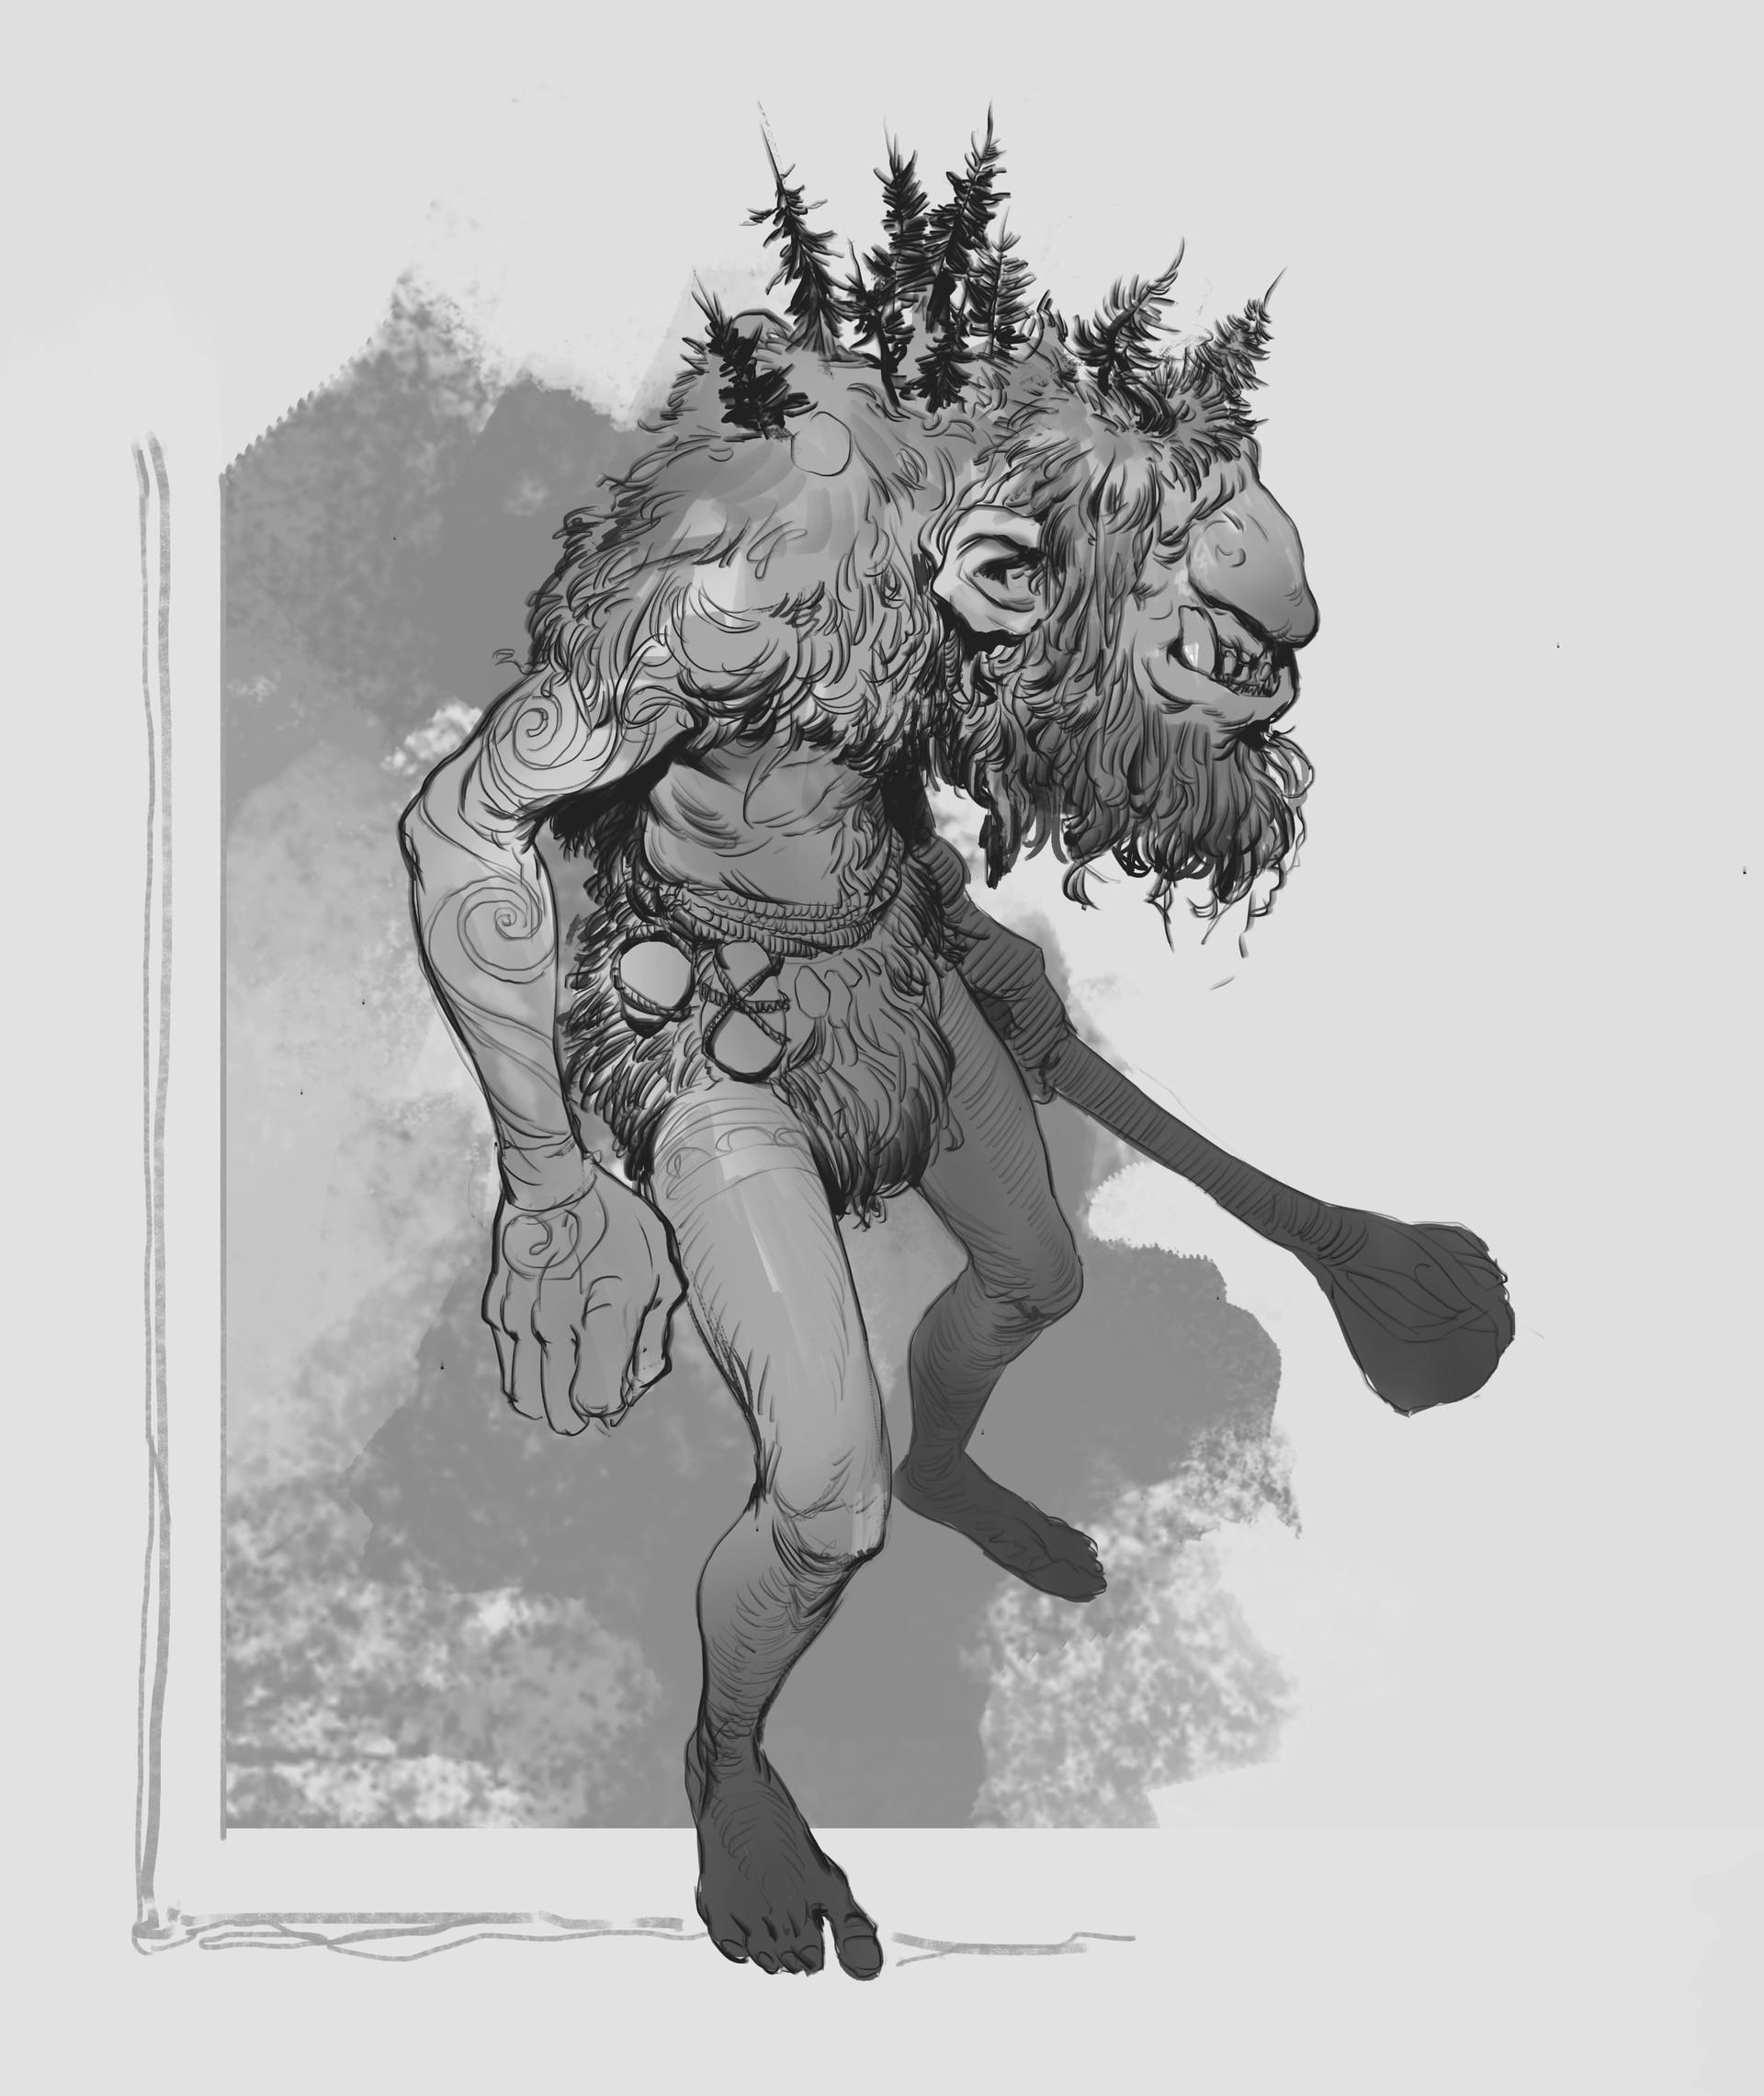 even-amundsen-89-forest-troll.jpg